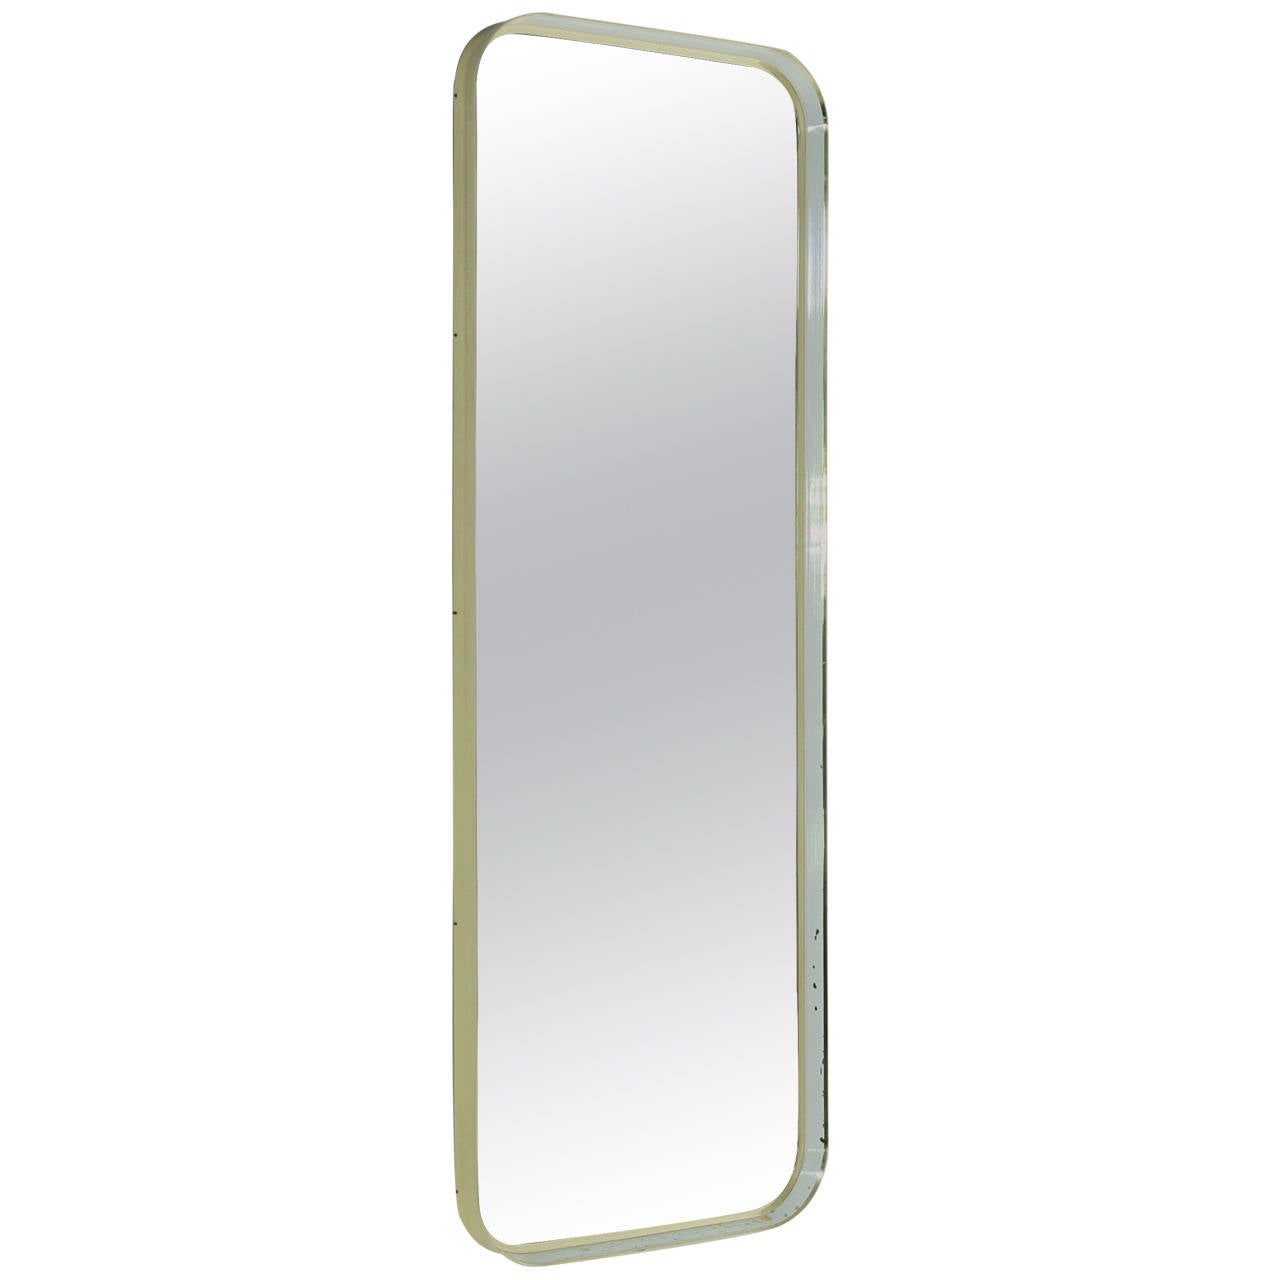 Large Brass Hallway Or Dressing Mirror At 1stdibs